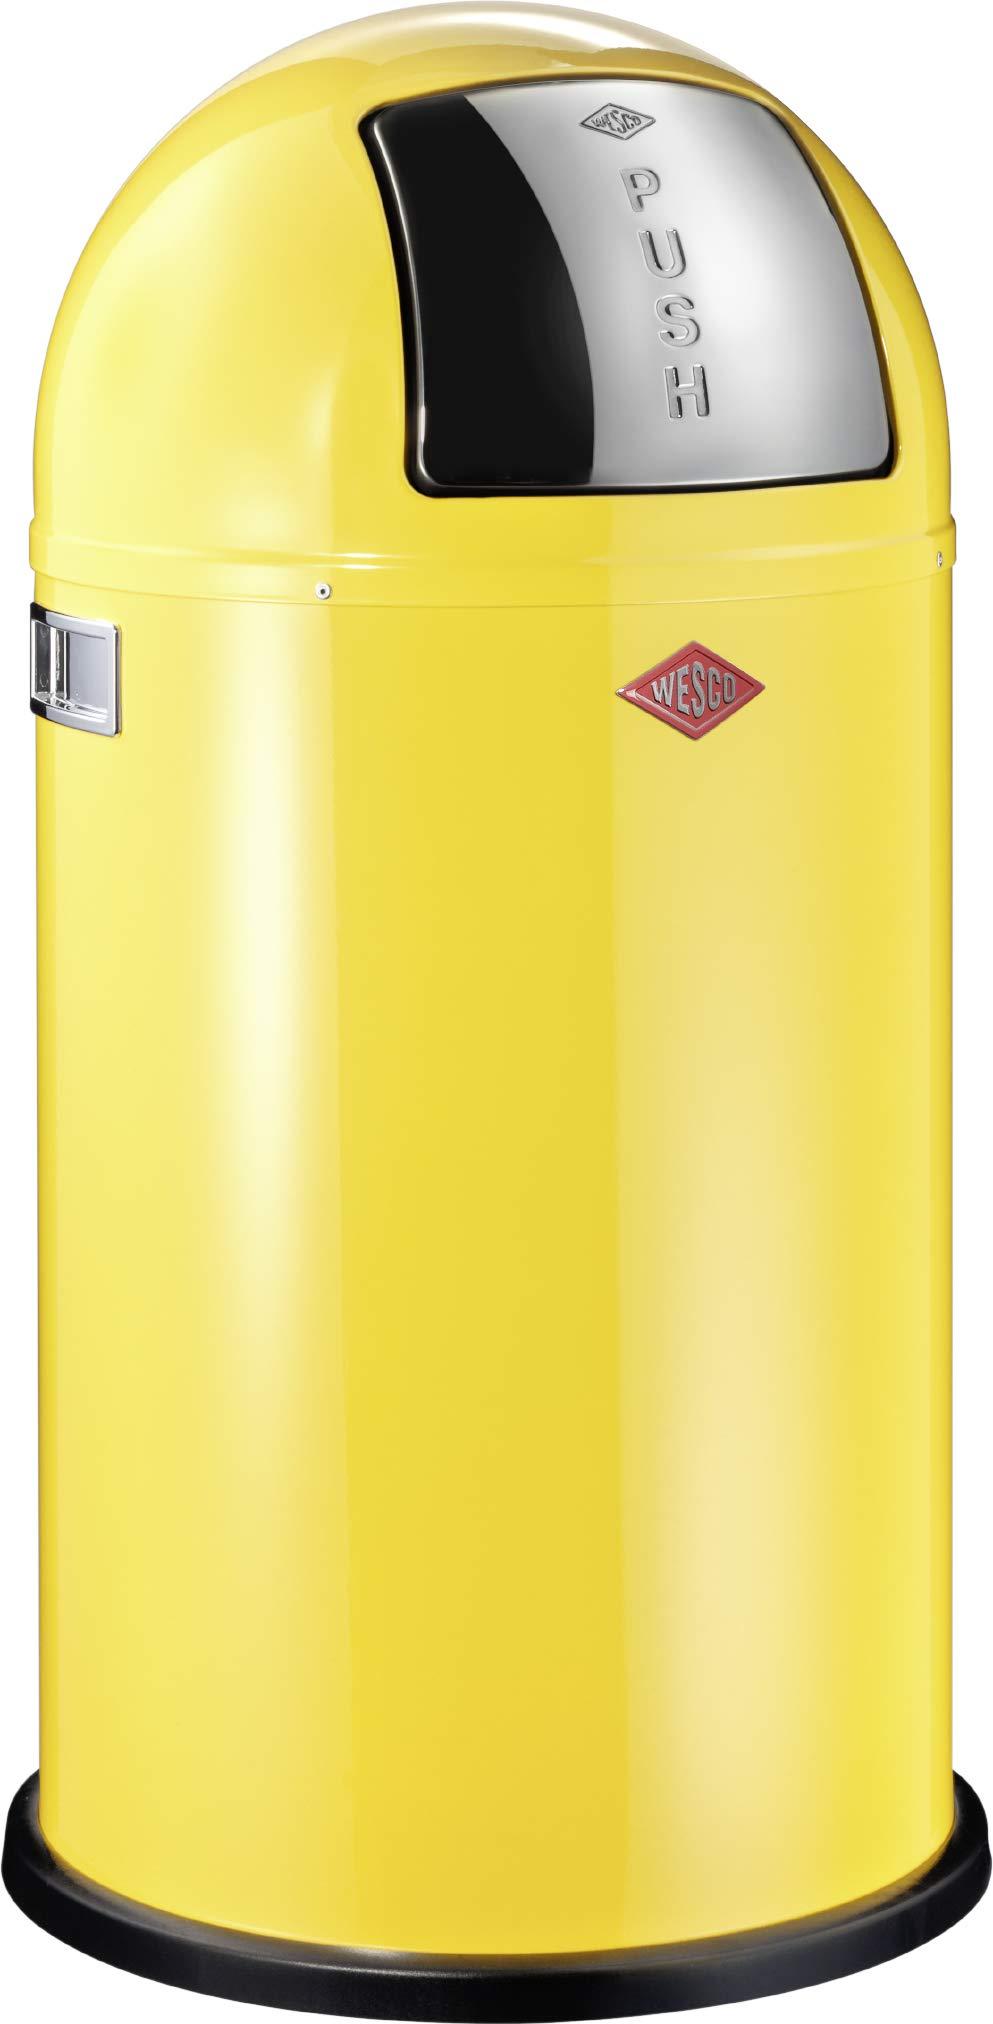 Wesco Pushboy-German Made-Push Door Trash Can, Powder Coated Steel, 13.2 Gallon / 50L, Lemon Yellow